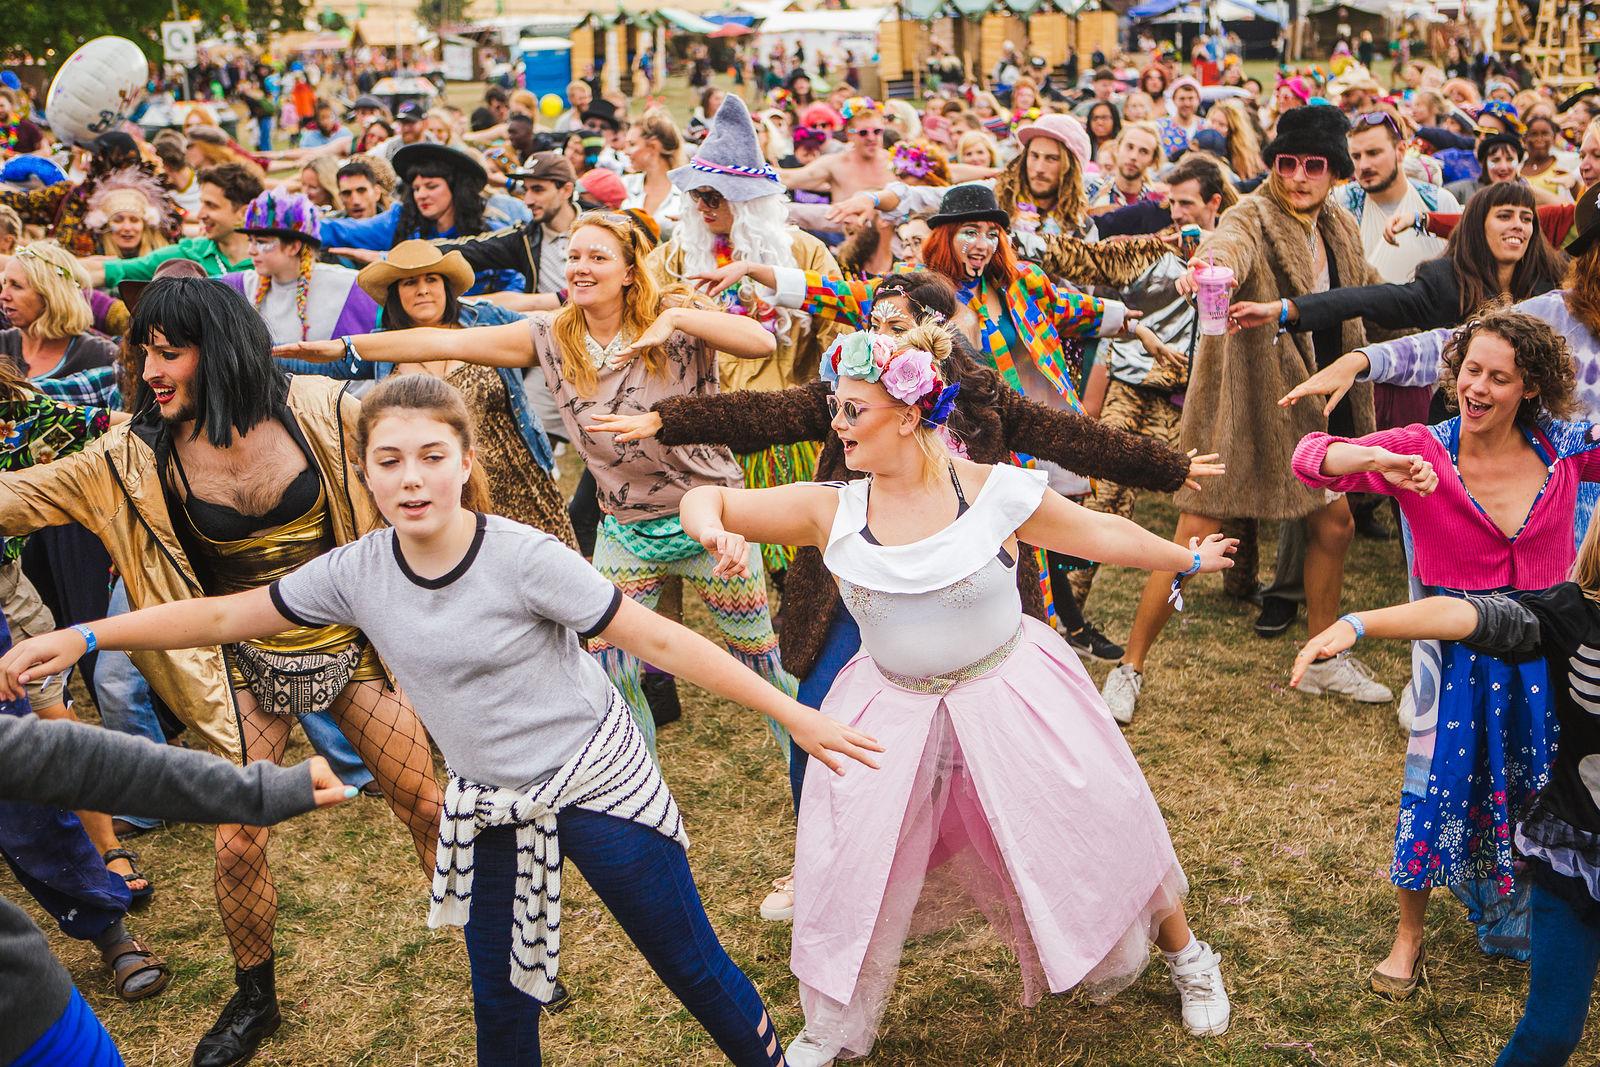 Shania Twain Flashmob Dance Flashmob